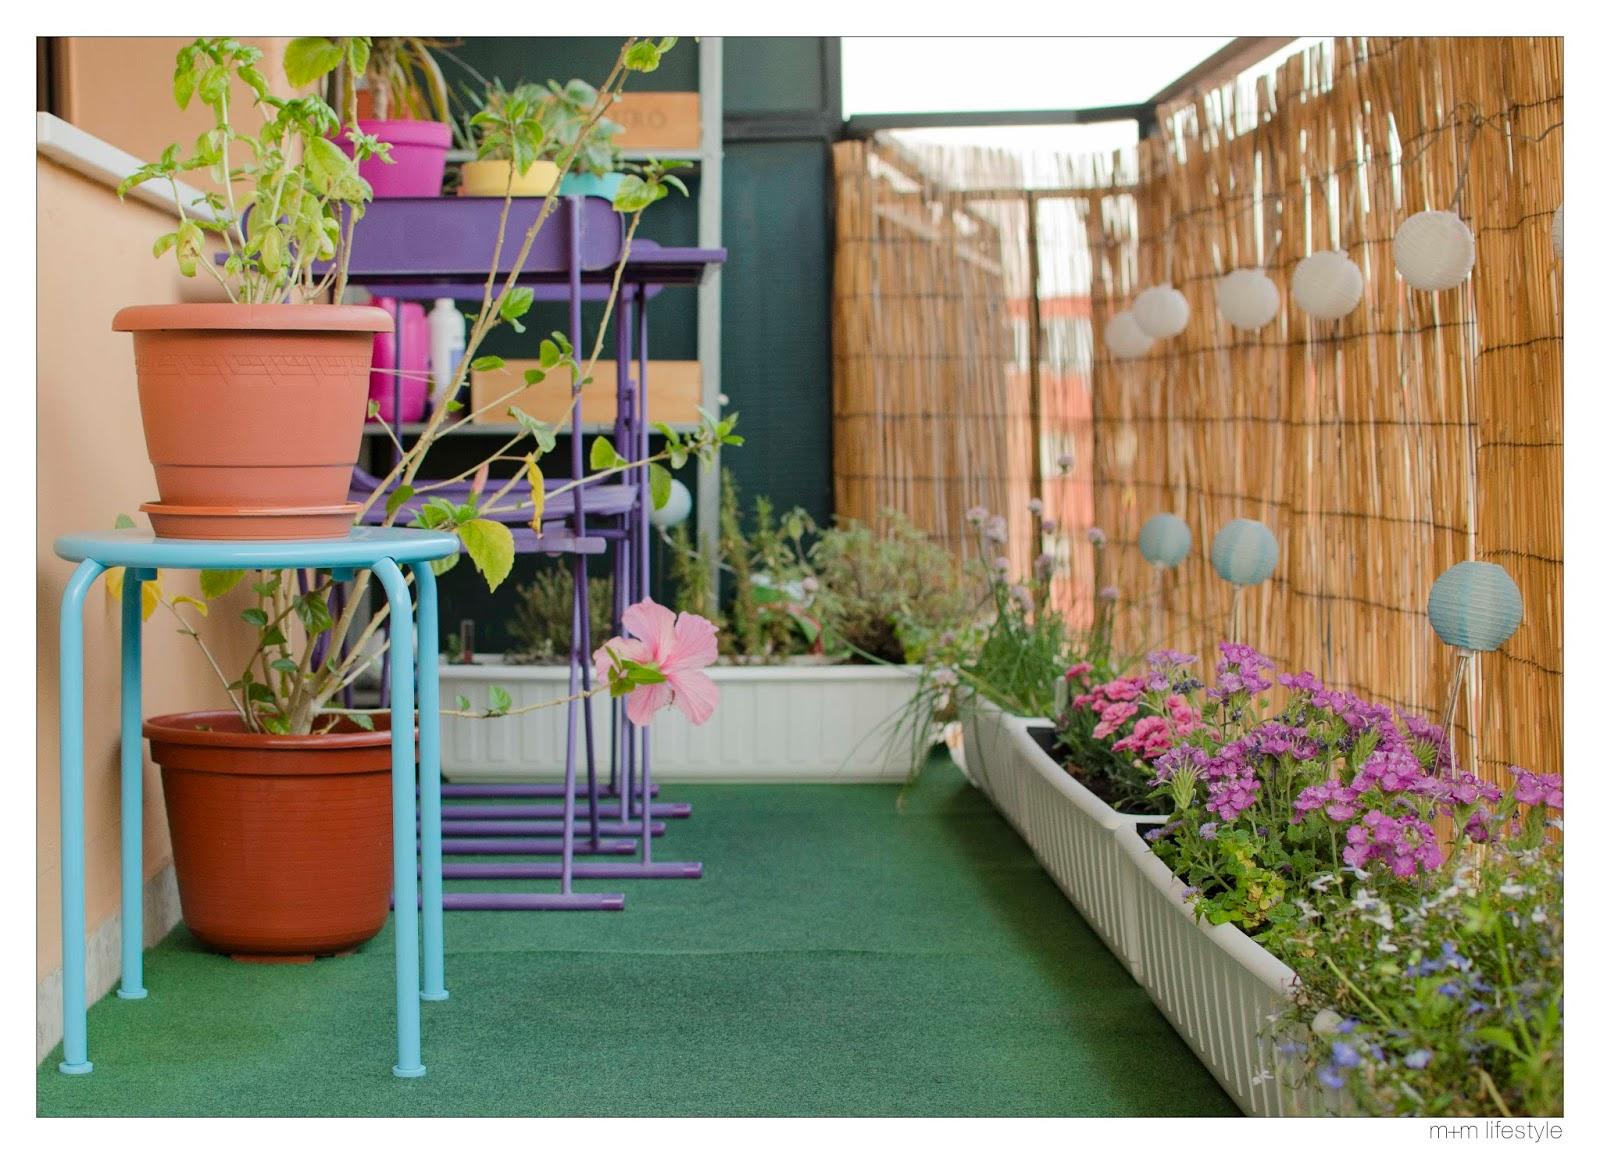 M m lifestyle ideas para decorar el balc n for Cesped artificial ikea